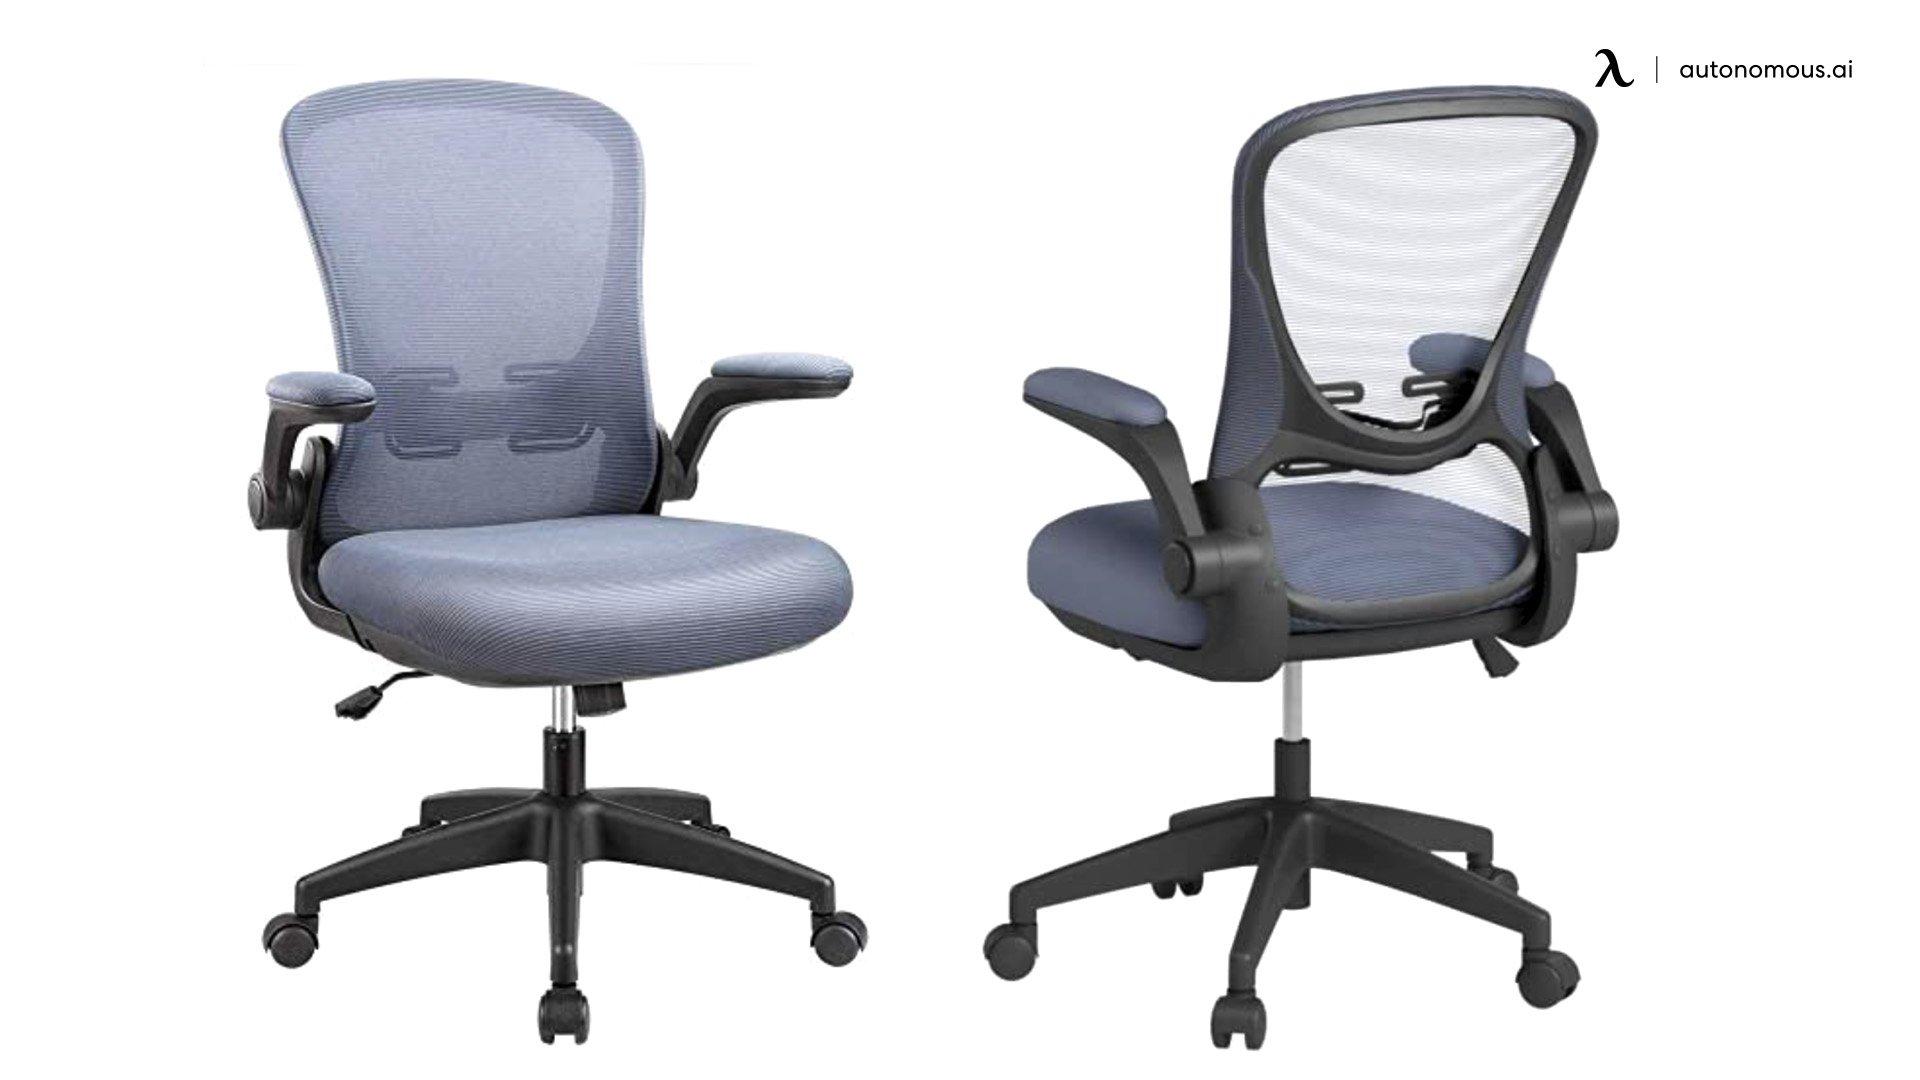 KaiMeng Ergonomic Office Chair